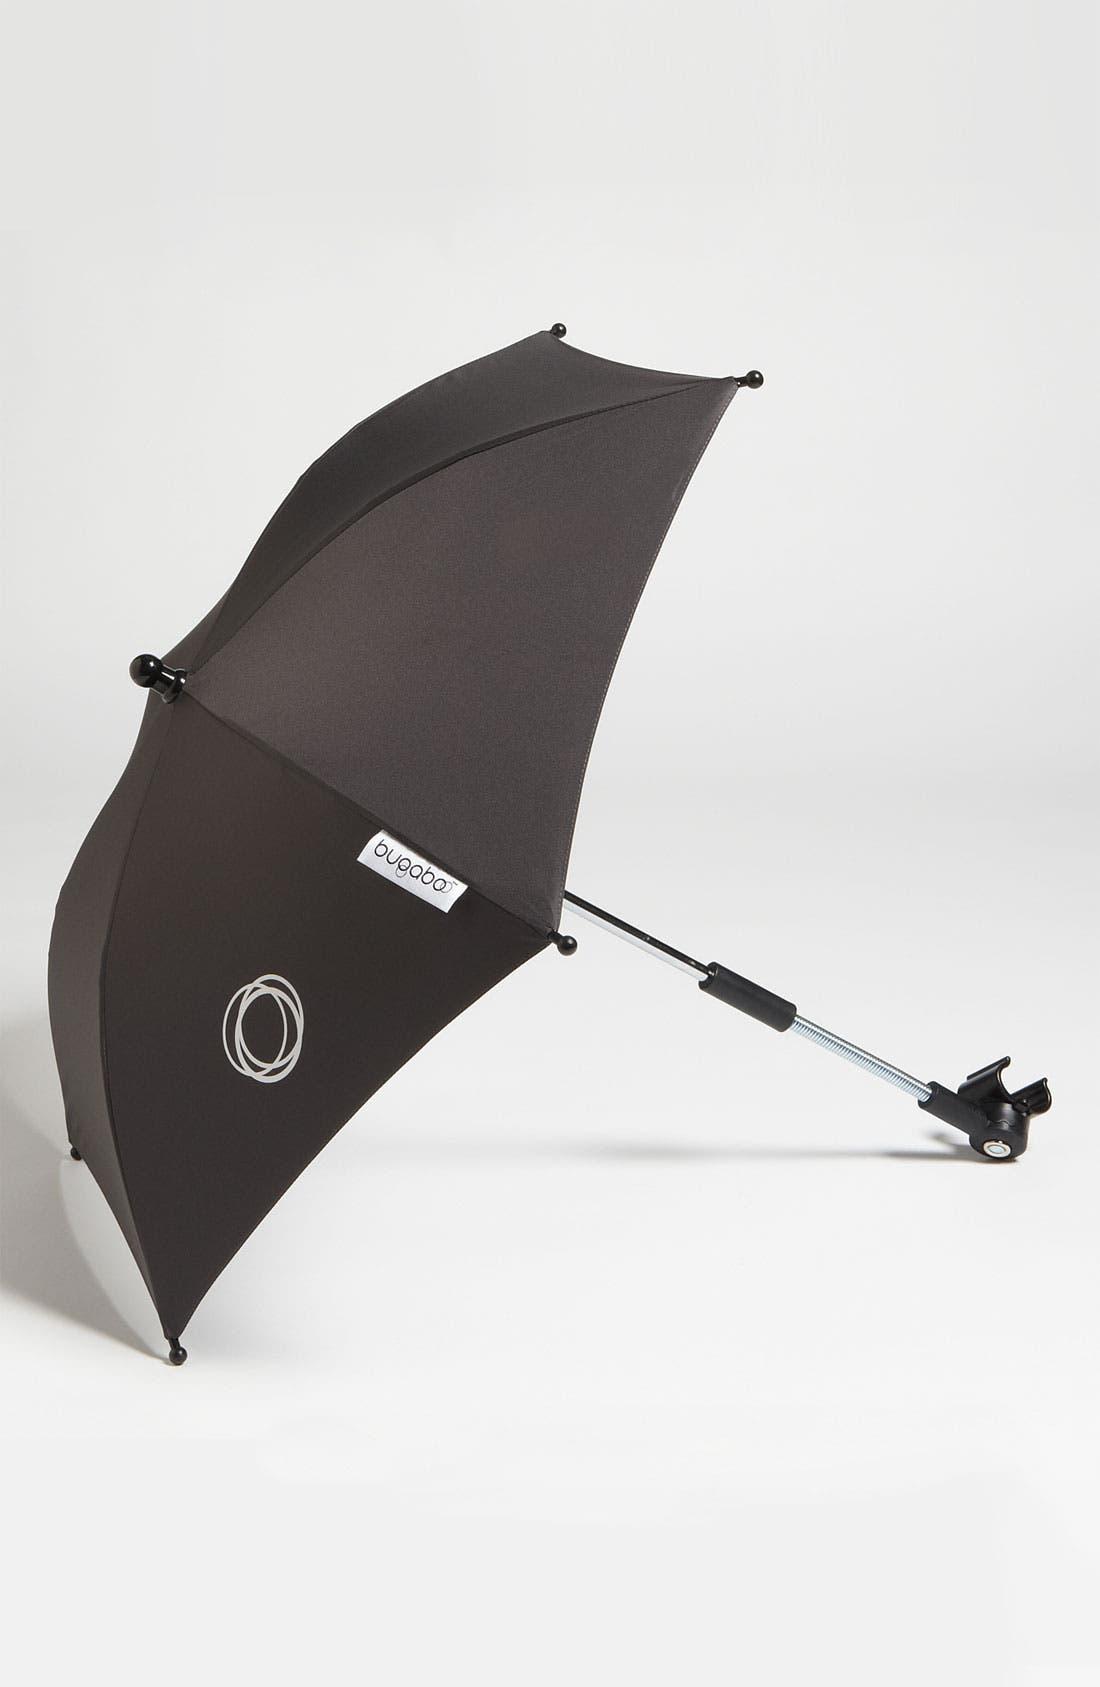 Alternate Image 1 Selected - Bugaboo Universal Stroller Parasol